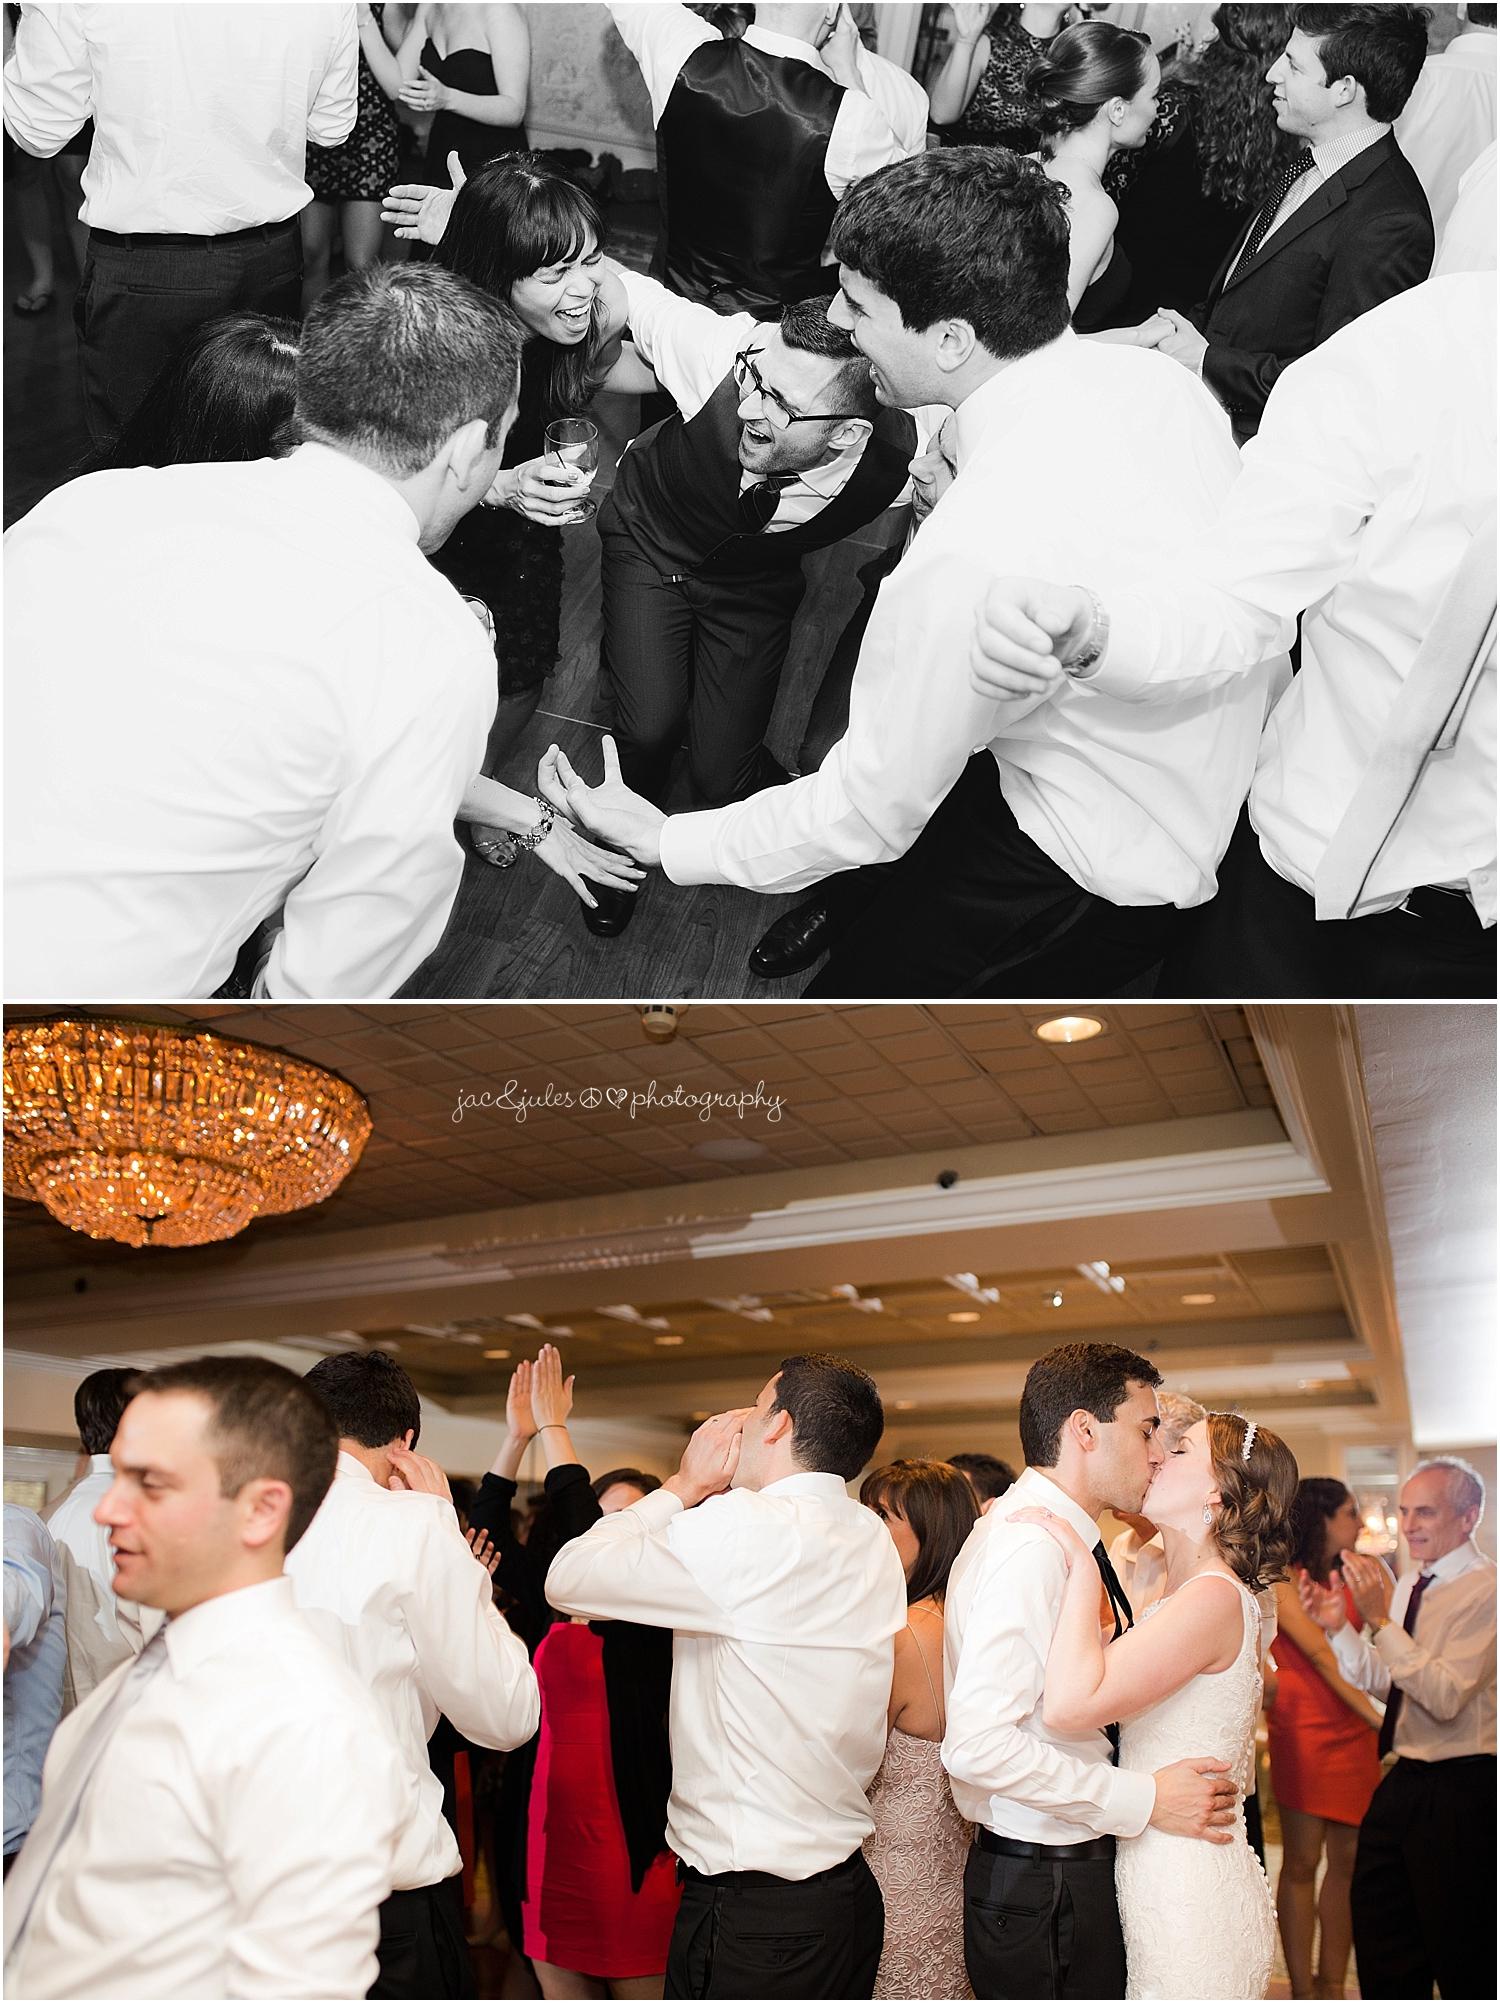 jacnjules photograph fun, wild wedding reception at the olde mill inn in basking ridge nj